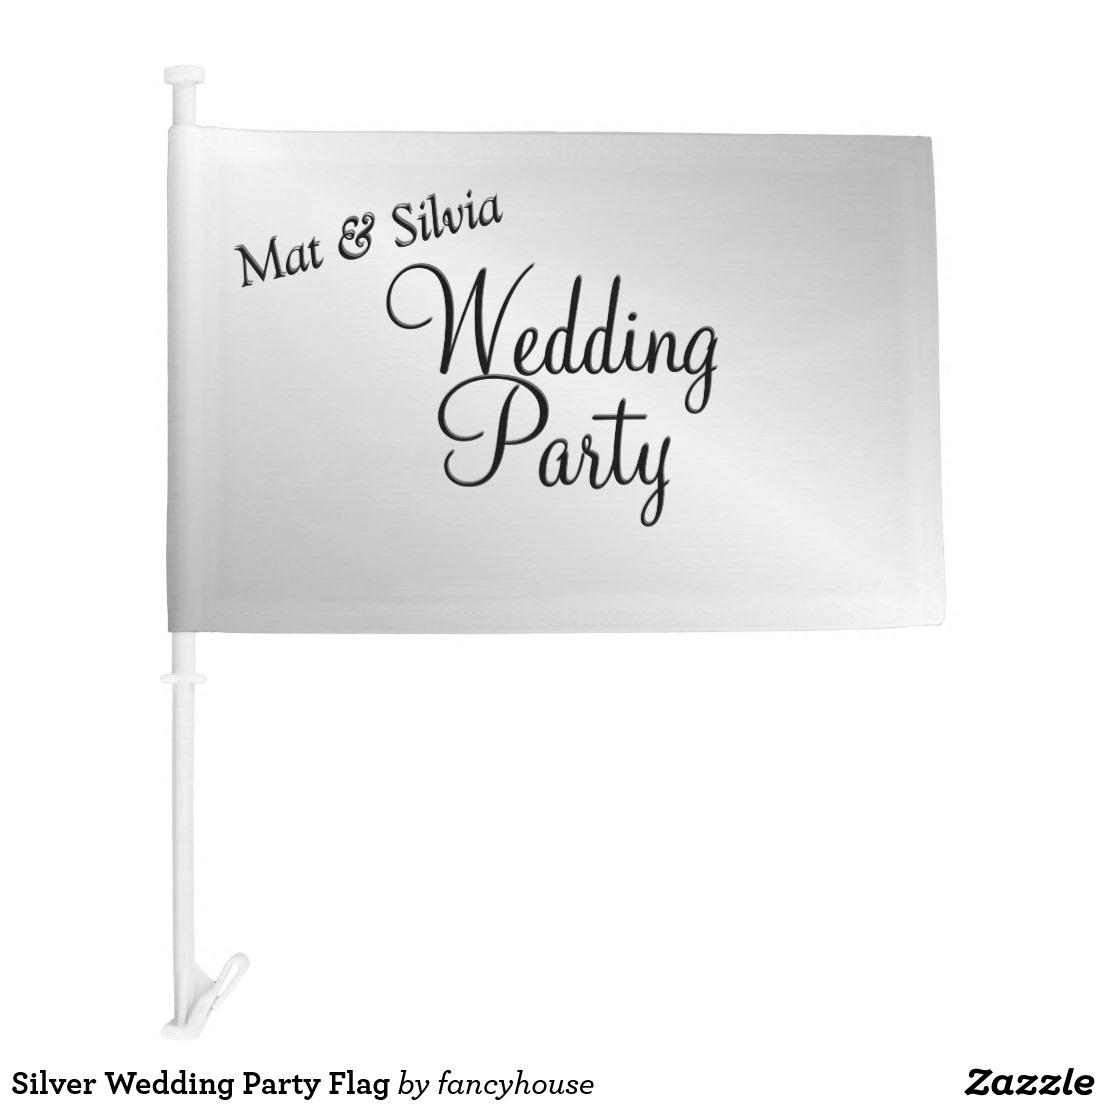 Silver Wedding Party Flag